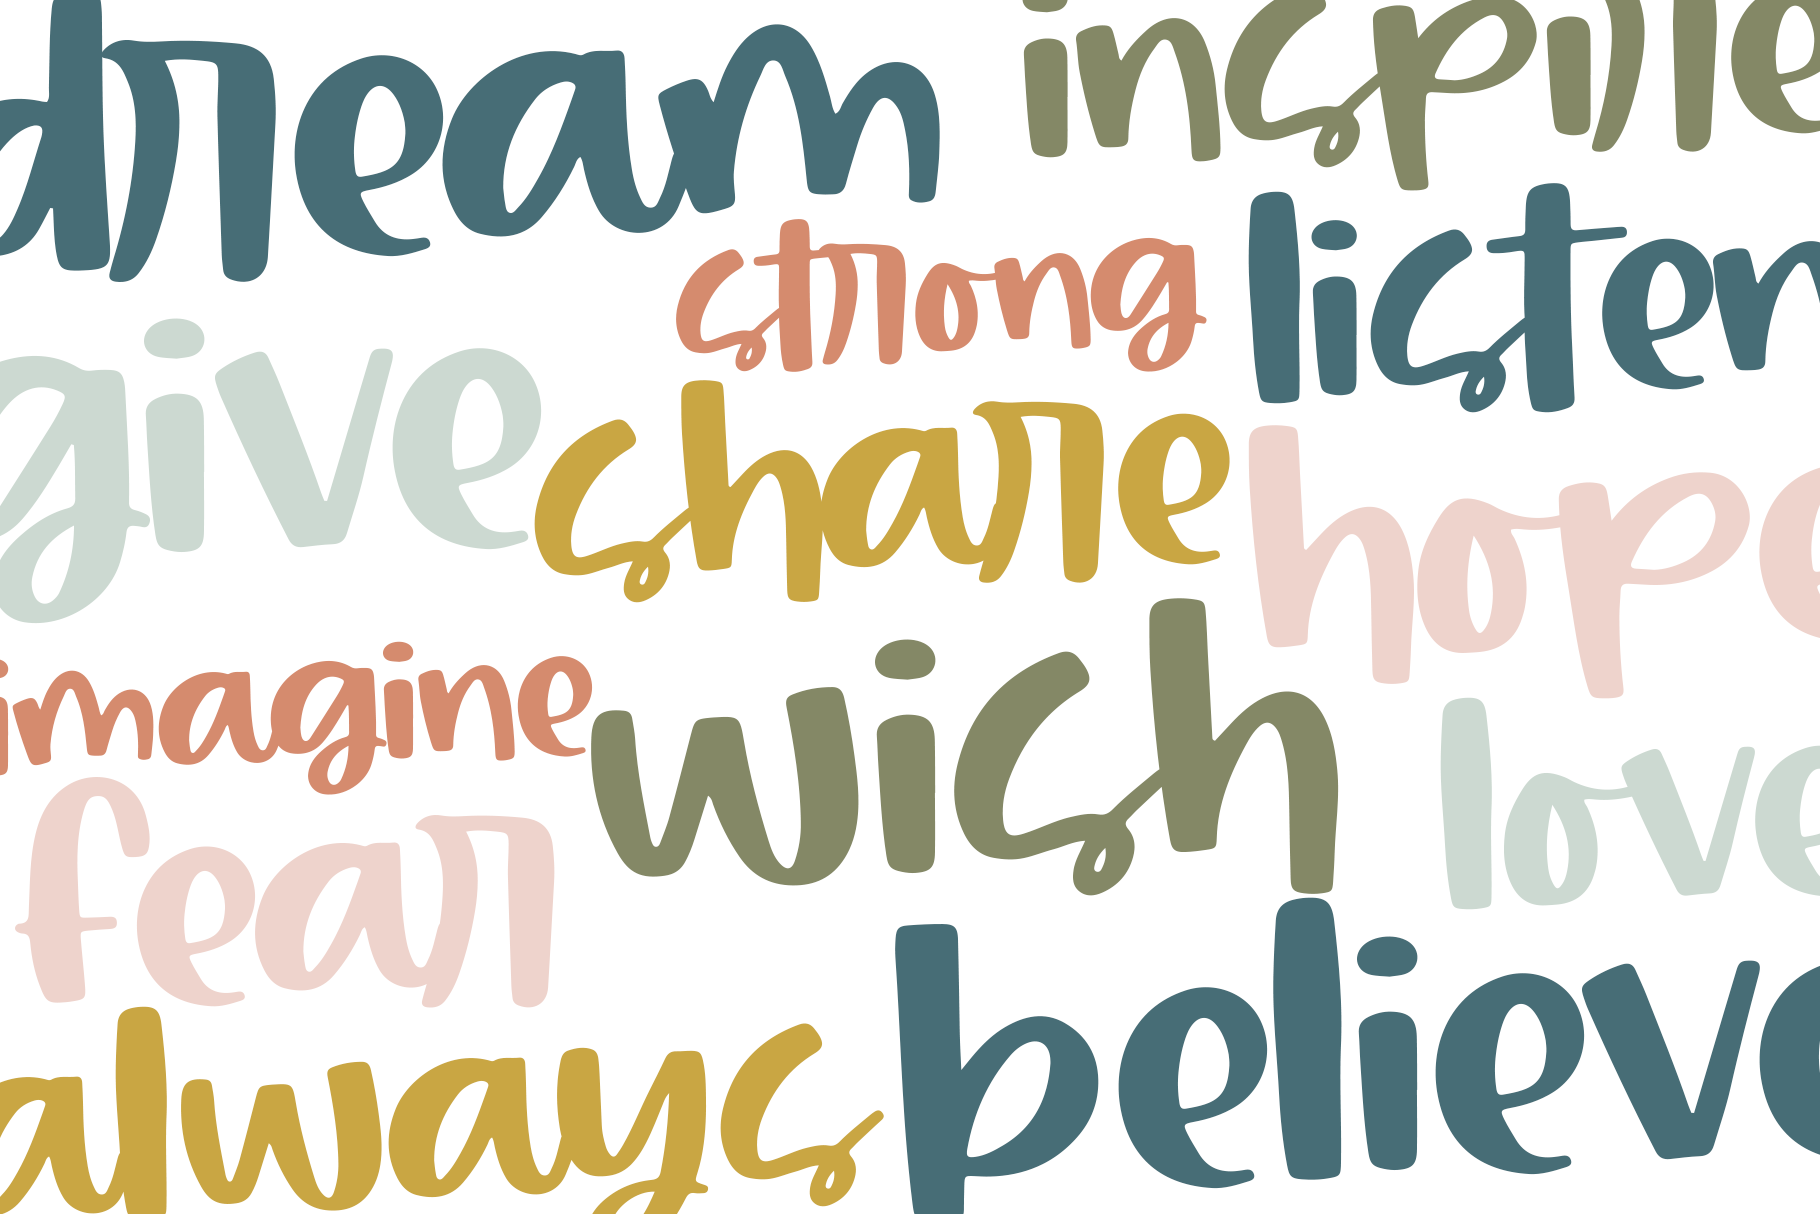 Primrose - Handwritten Script Font with Extras example image 10